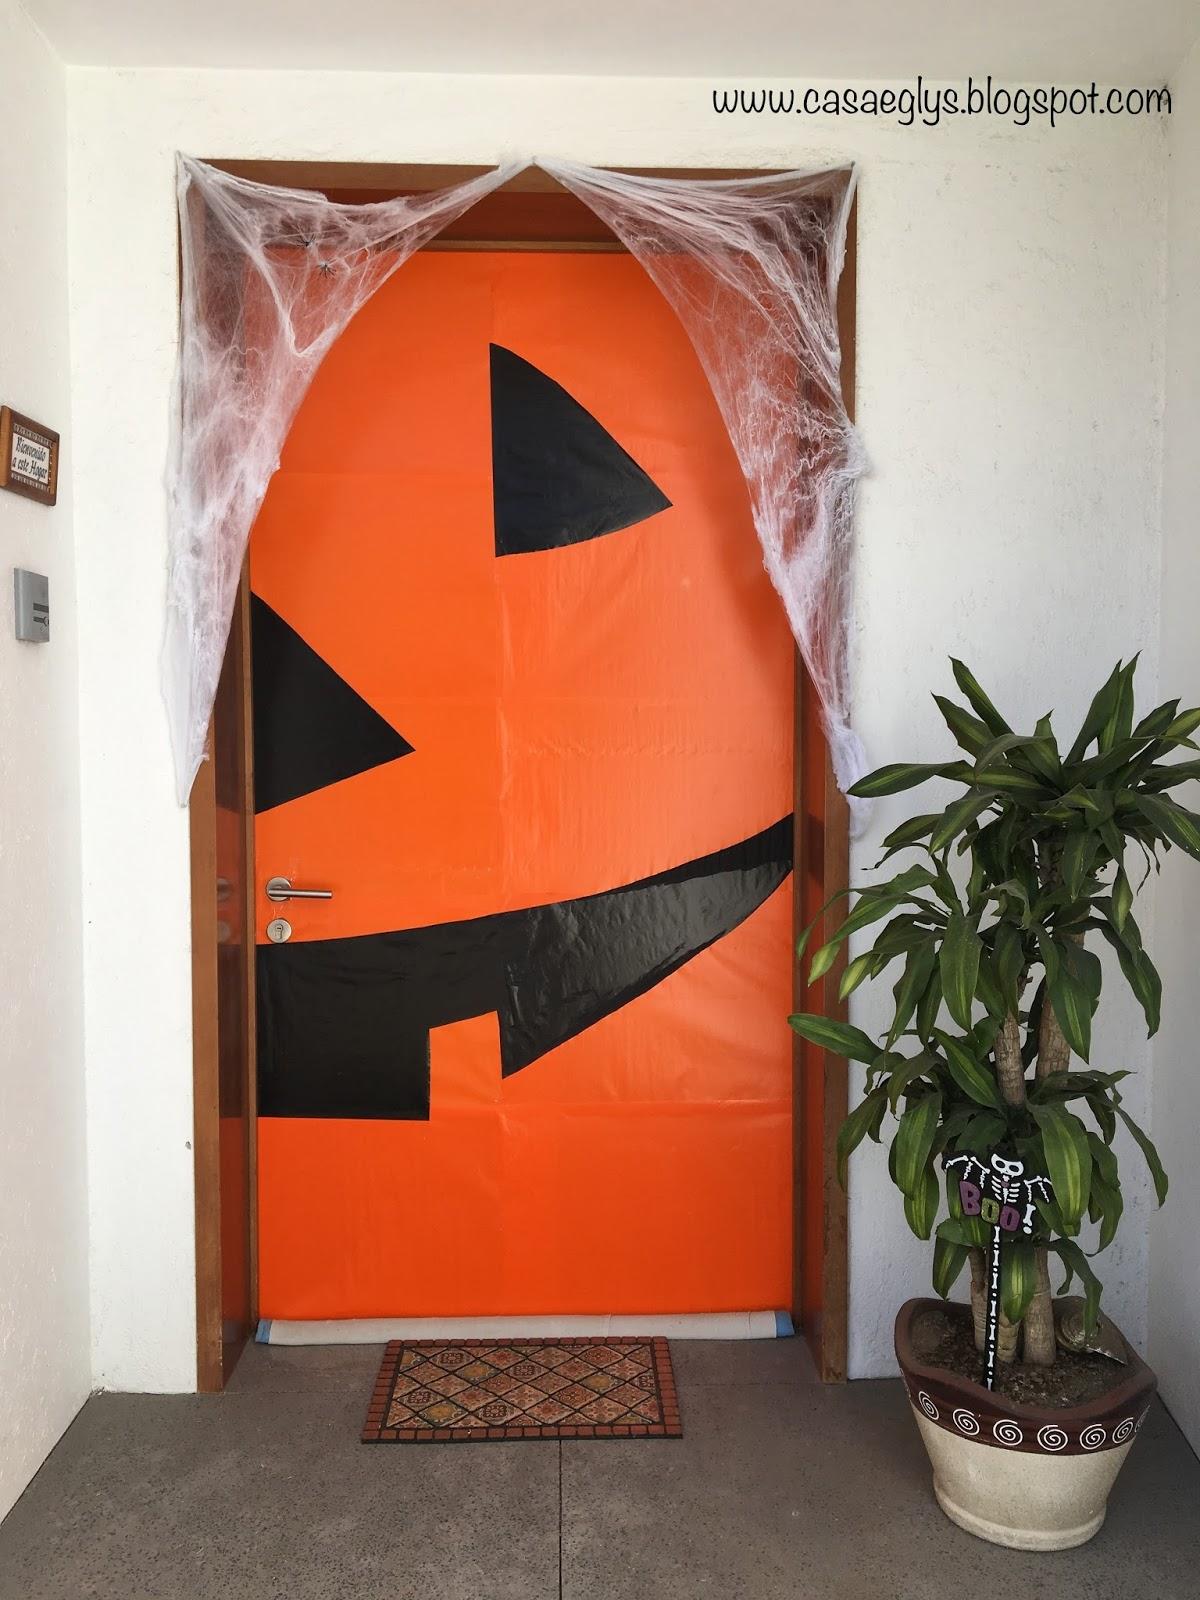 Casa eglys decoraci n puerta halloween for Decoracion para puertas halloween